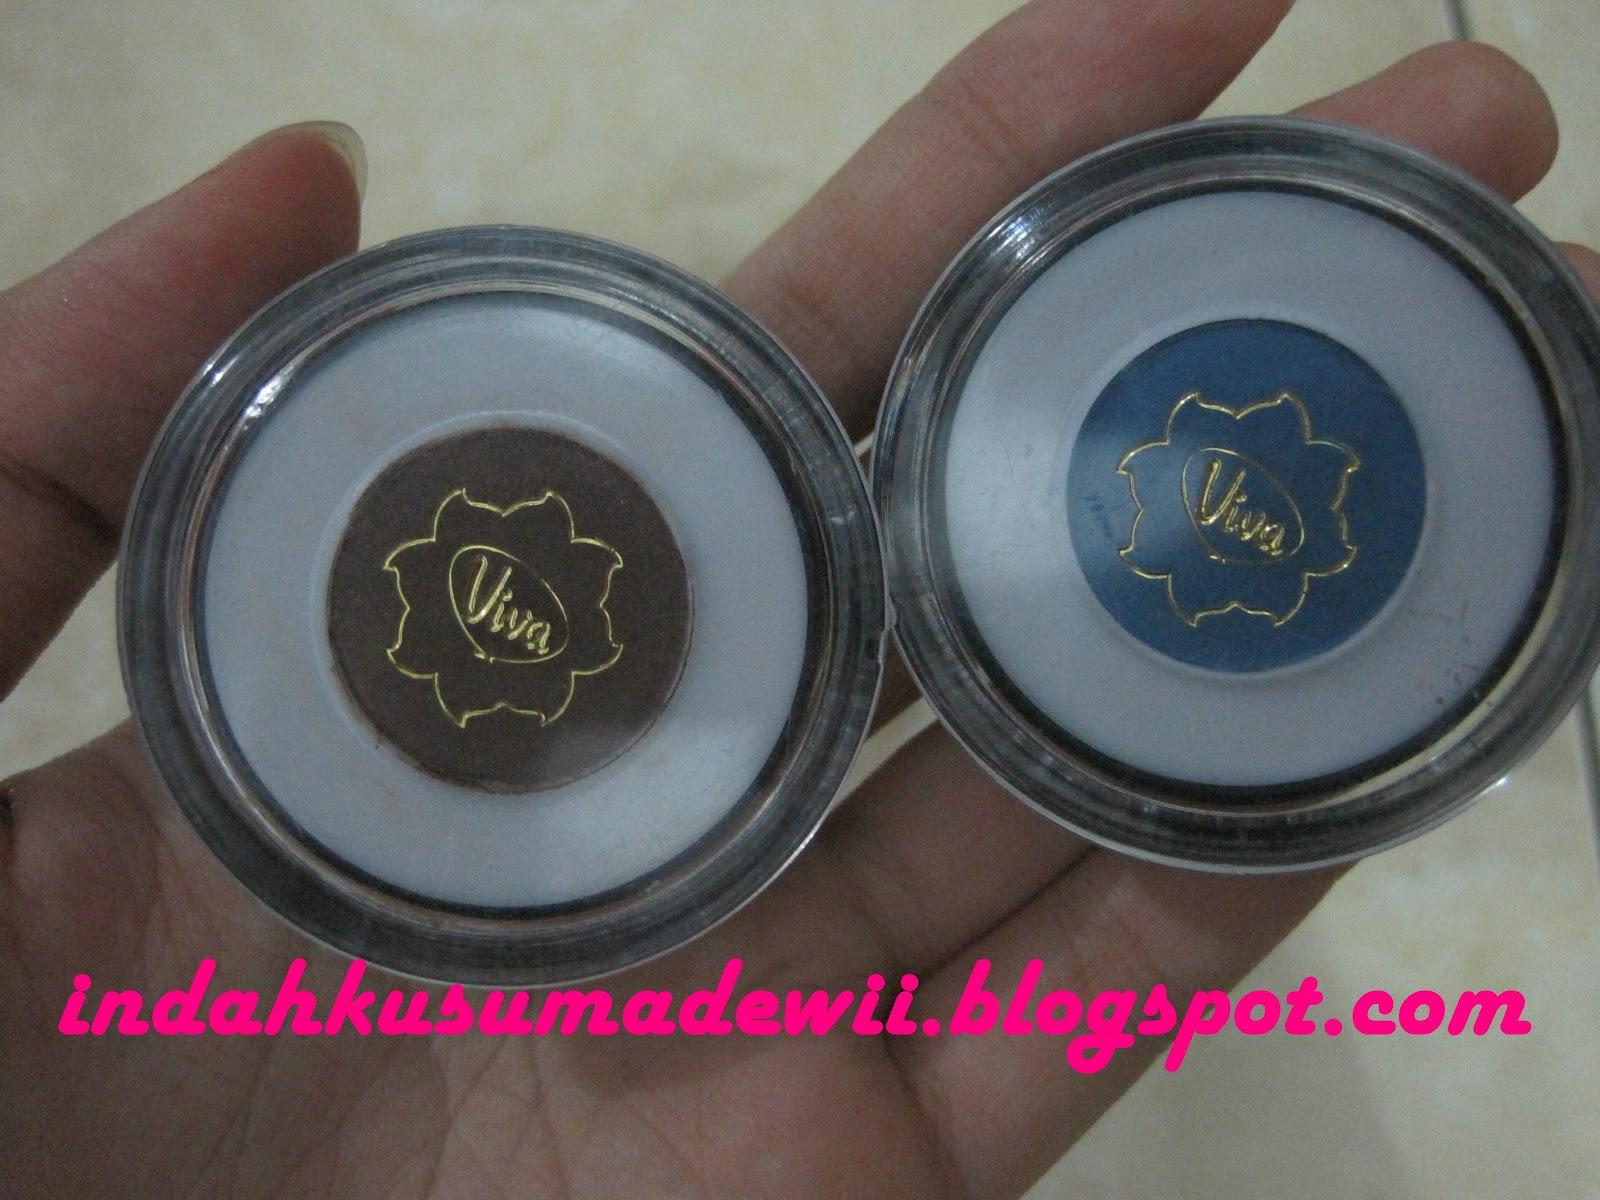 Indah Kusuma Dewi Viva Eye Shadow Cream